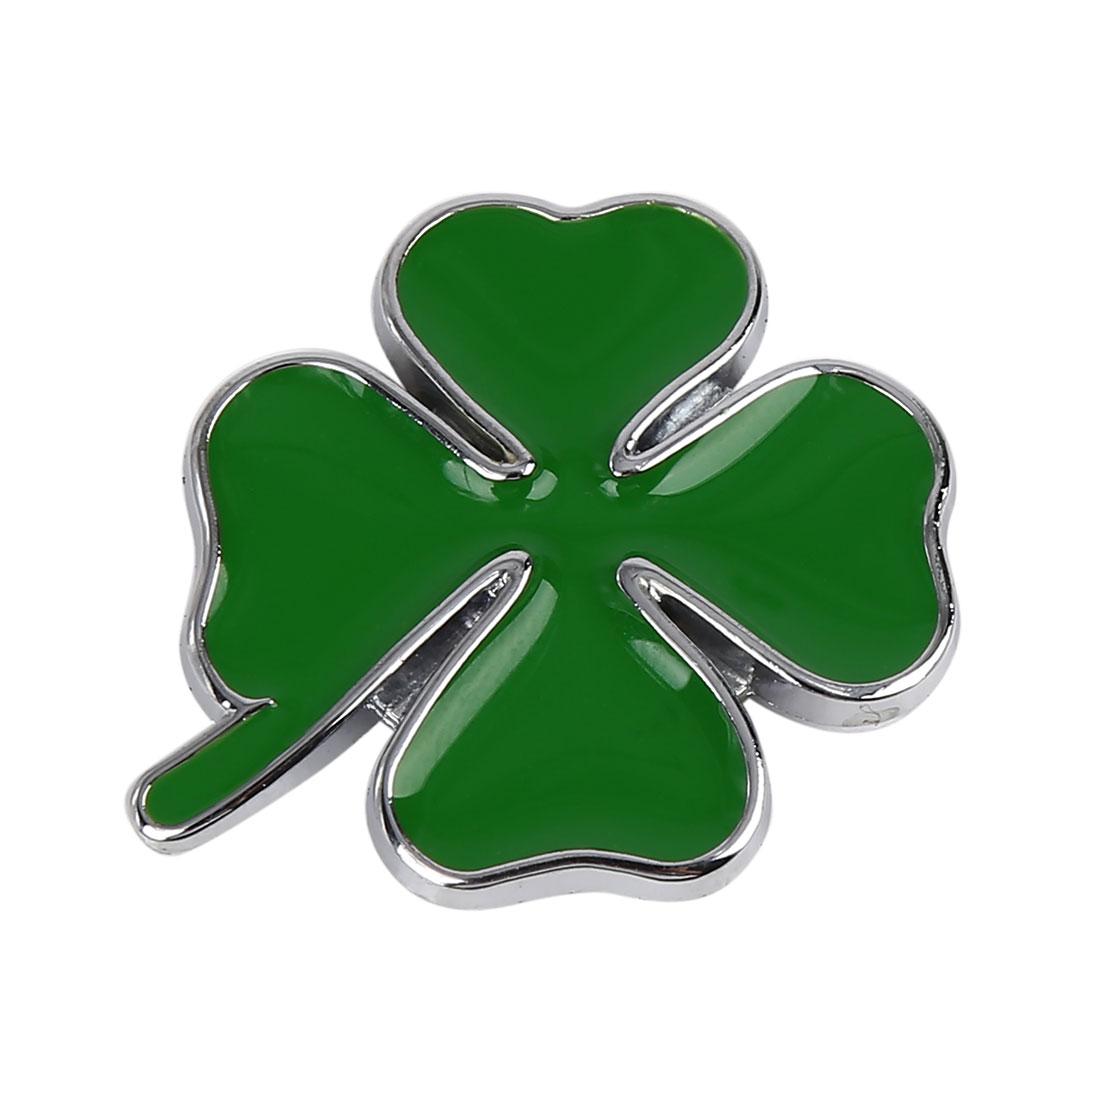 Green Four Leaves Shaped Car Decorative Emblem Badge Decal Sticker 4 x 3.5cm